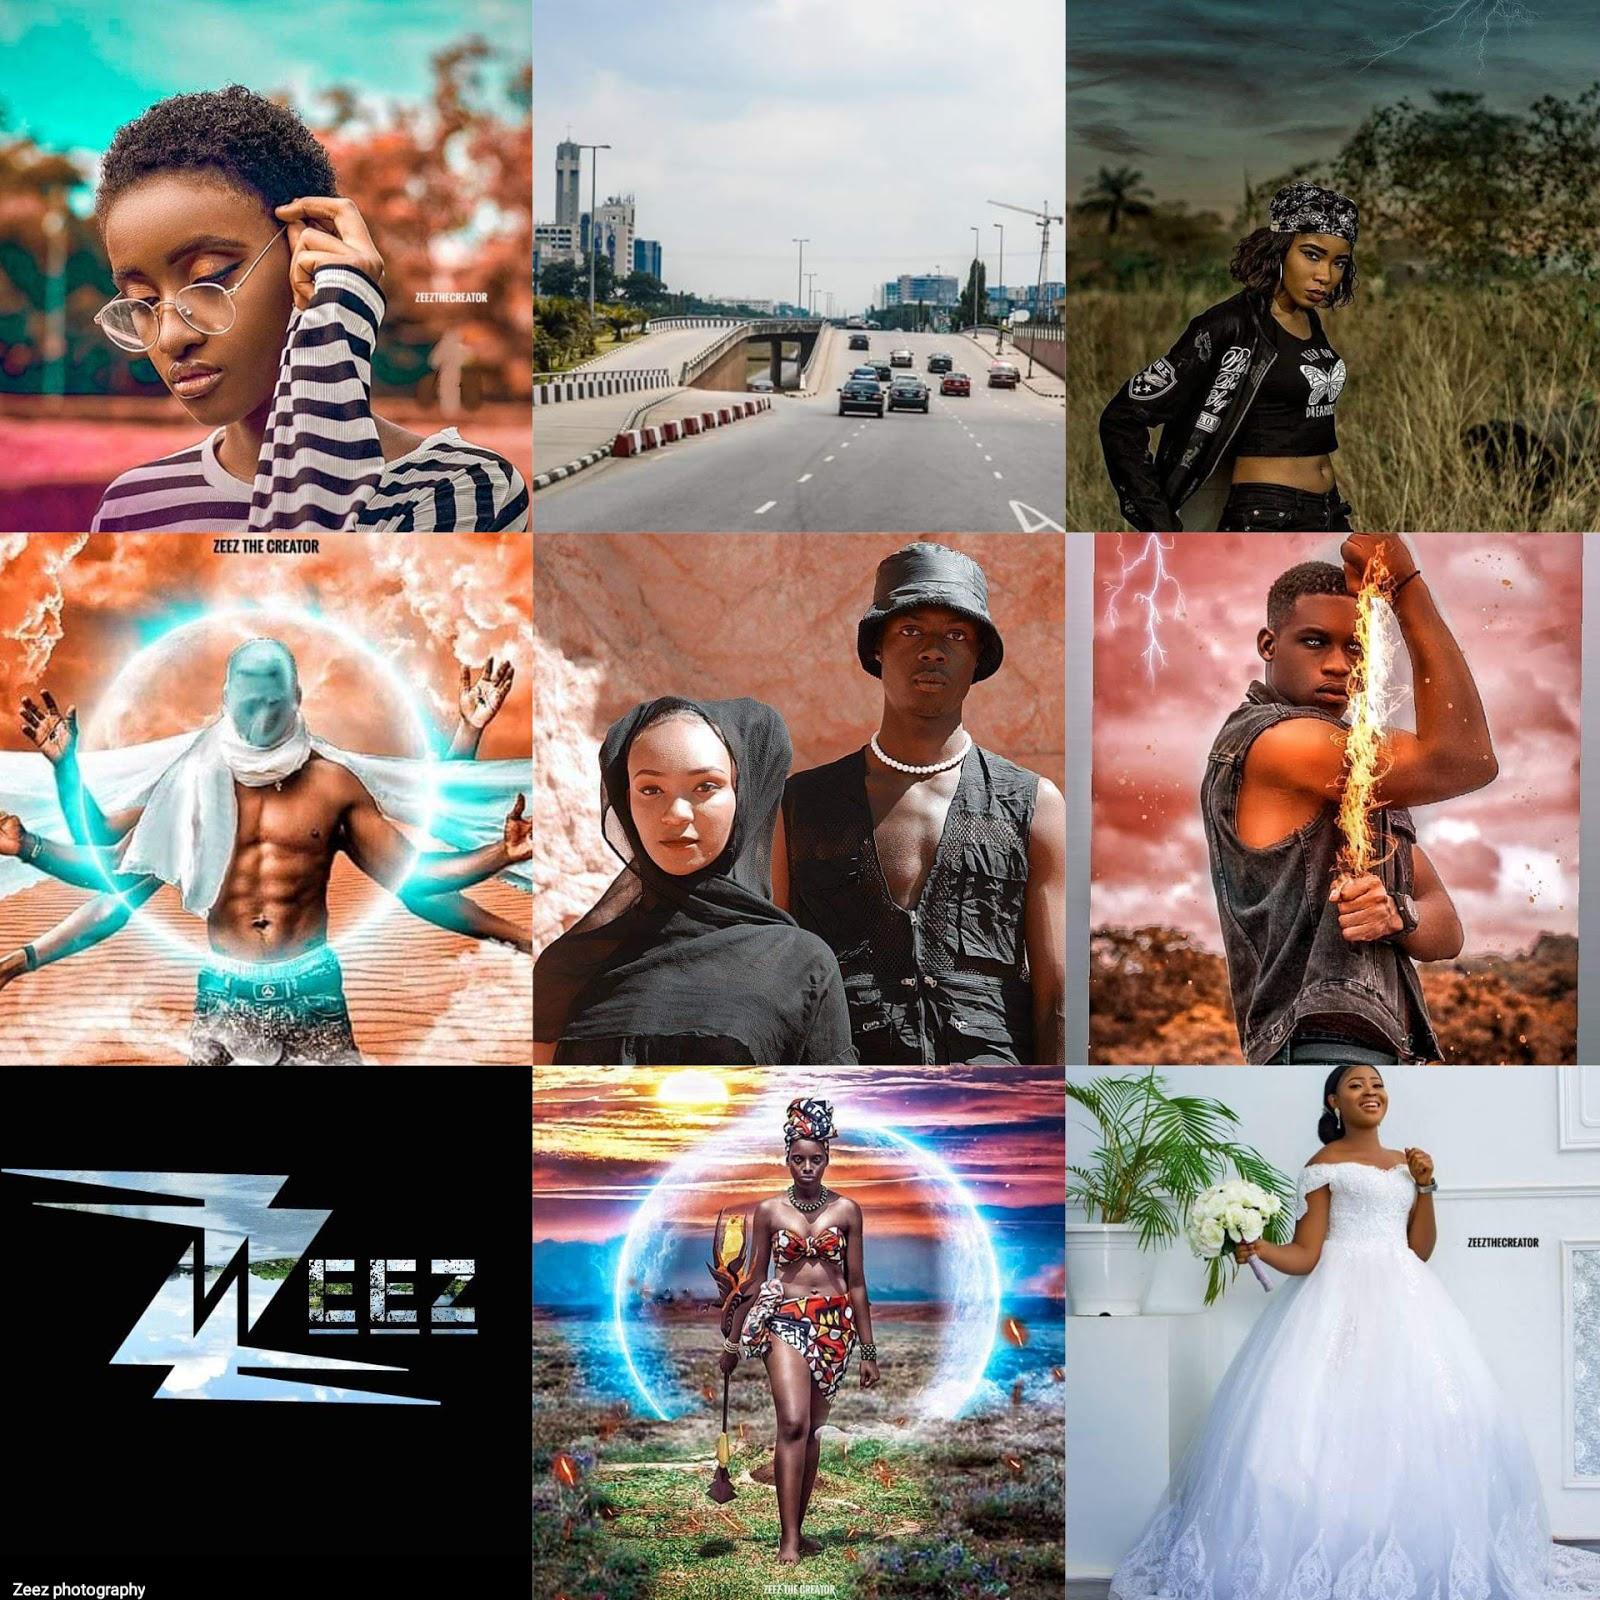 [Photography] Zeez Photography - Photography/Cinematography #Arewapublisize